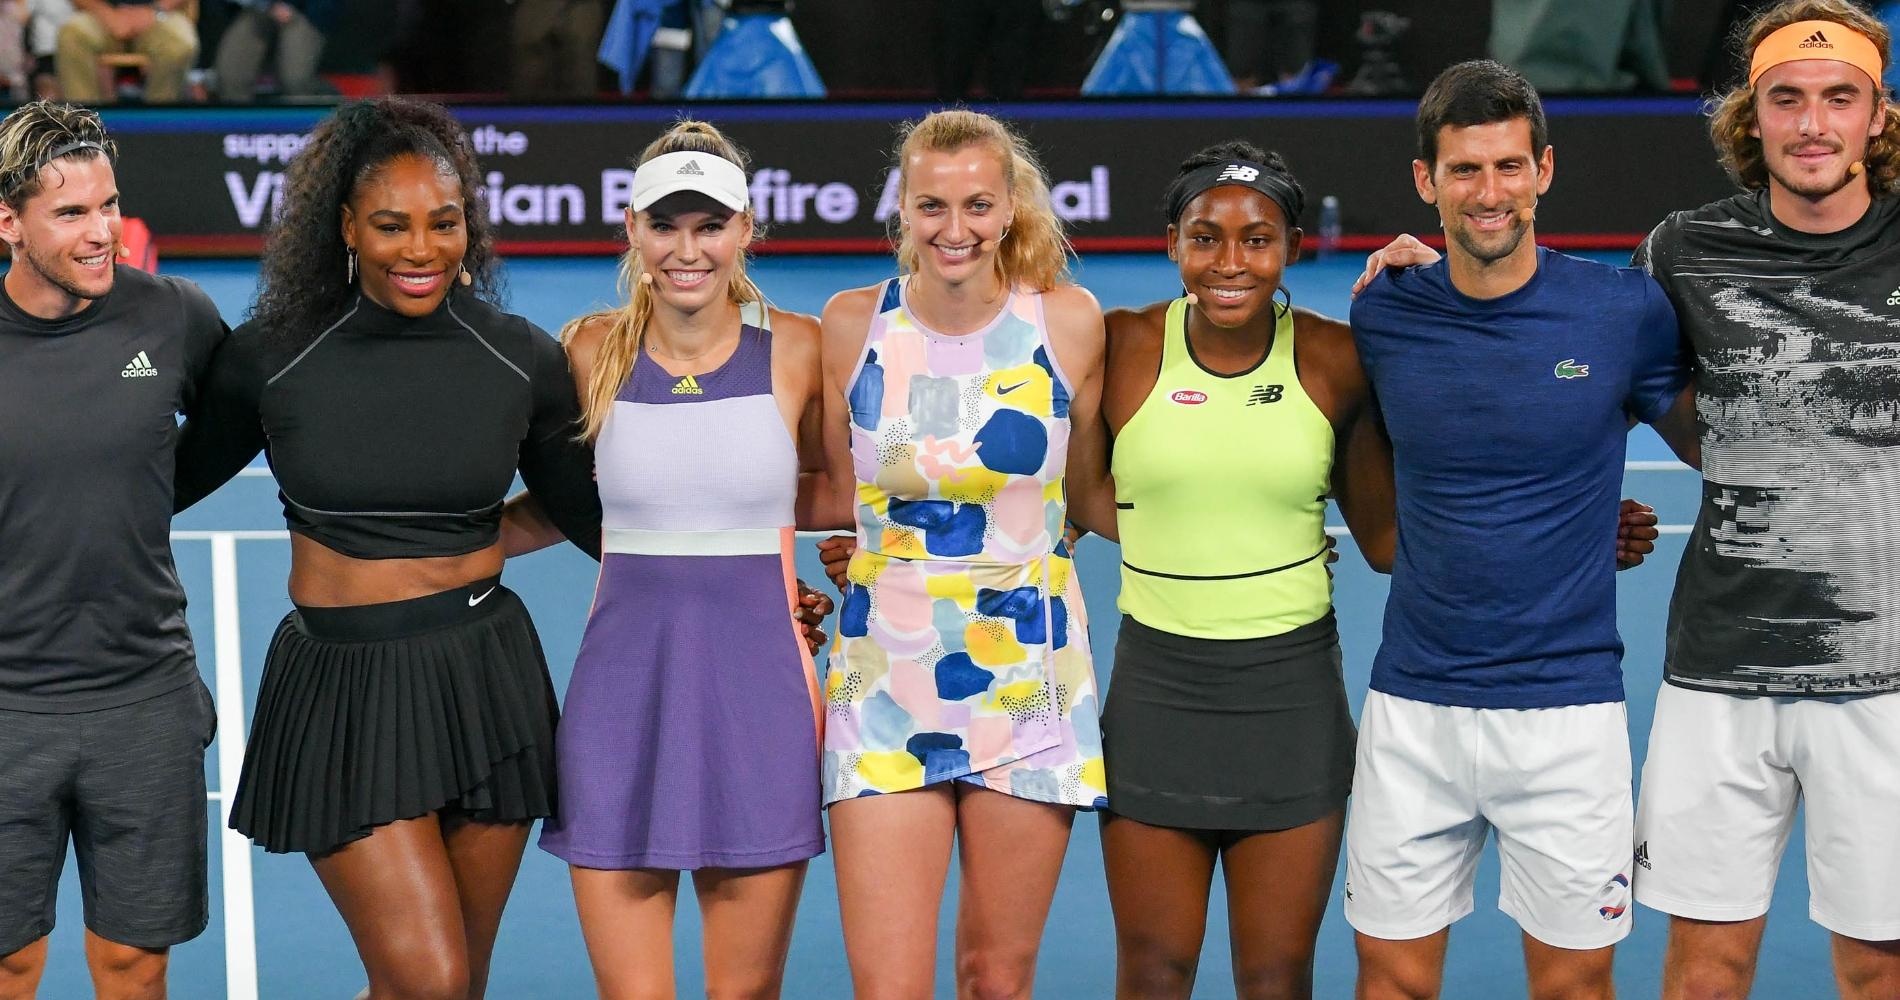 ATP and WTA stars